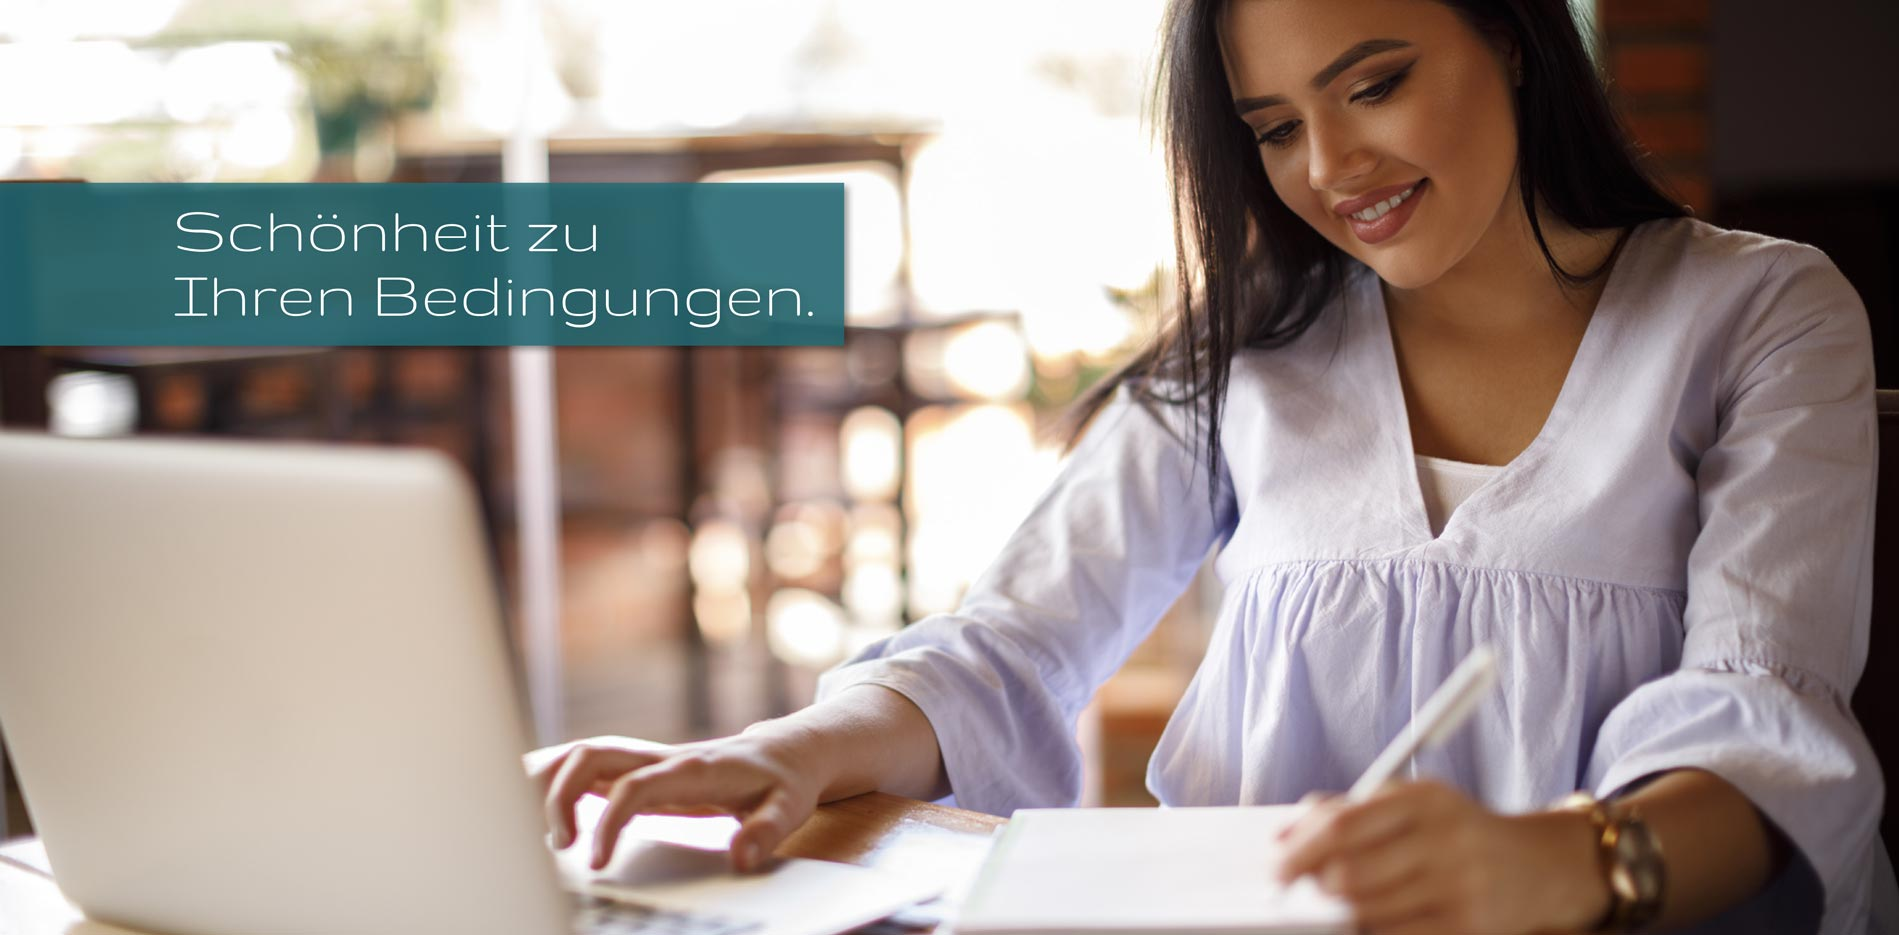 Kosmetik Kosmetikerin Kosmetikstudio Zürich Termin online buchen Microneedling BB Glow Mesotherapie Visagistin Make up Artist Braut Make up